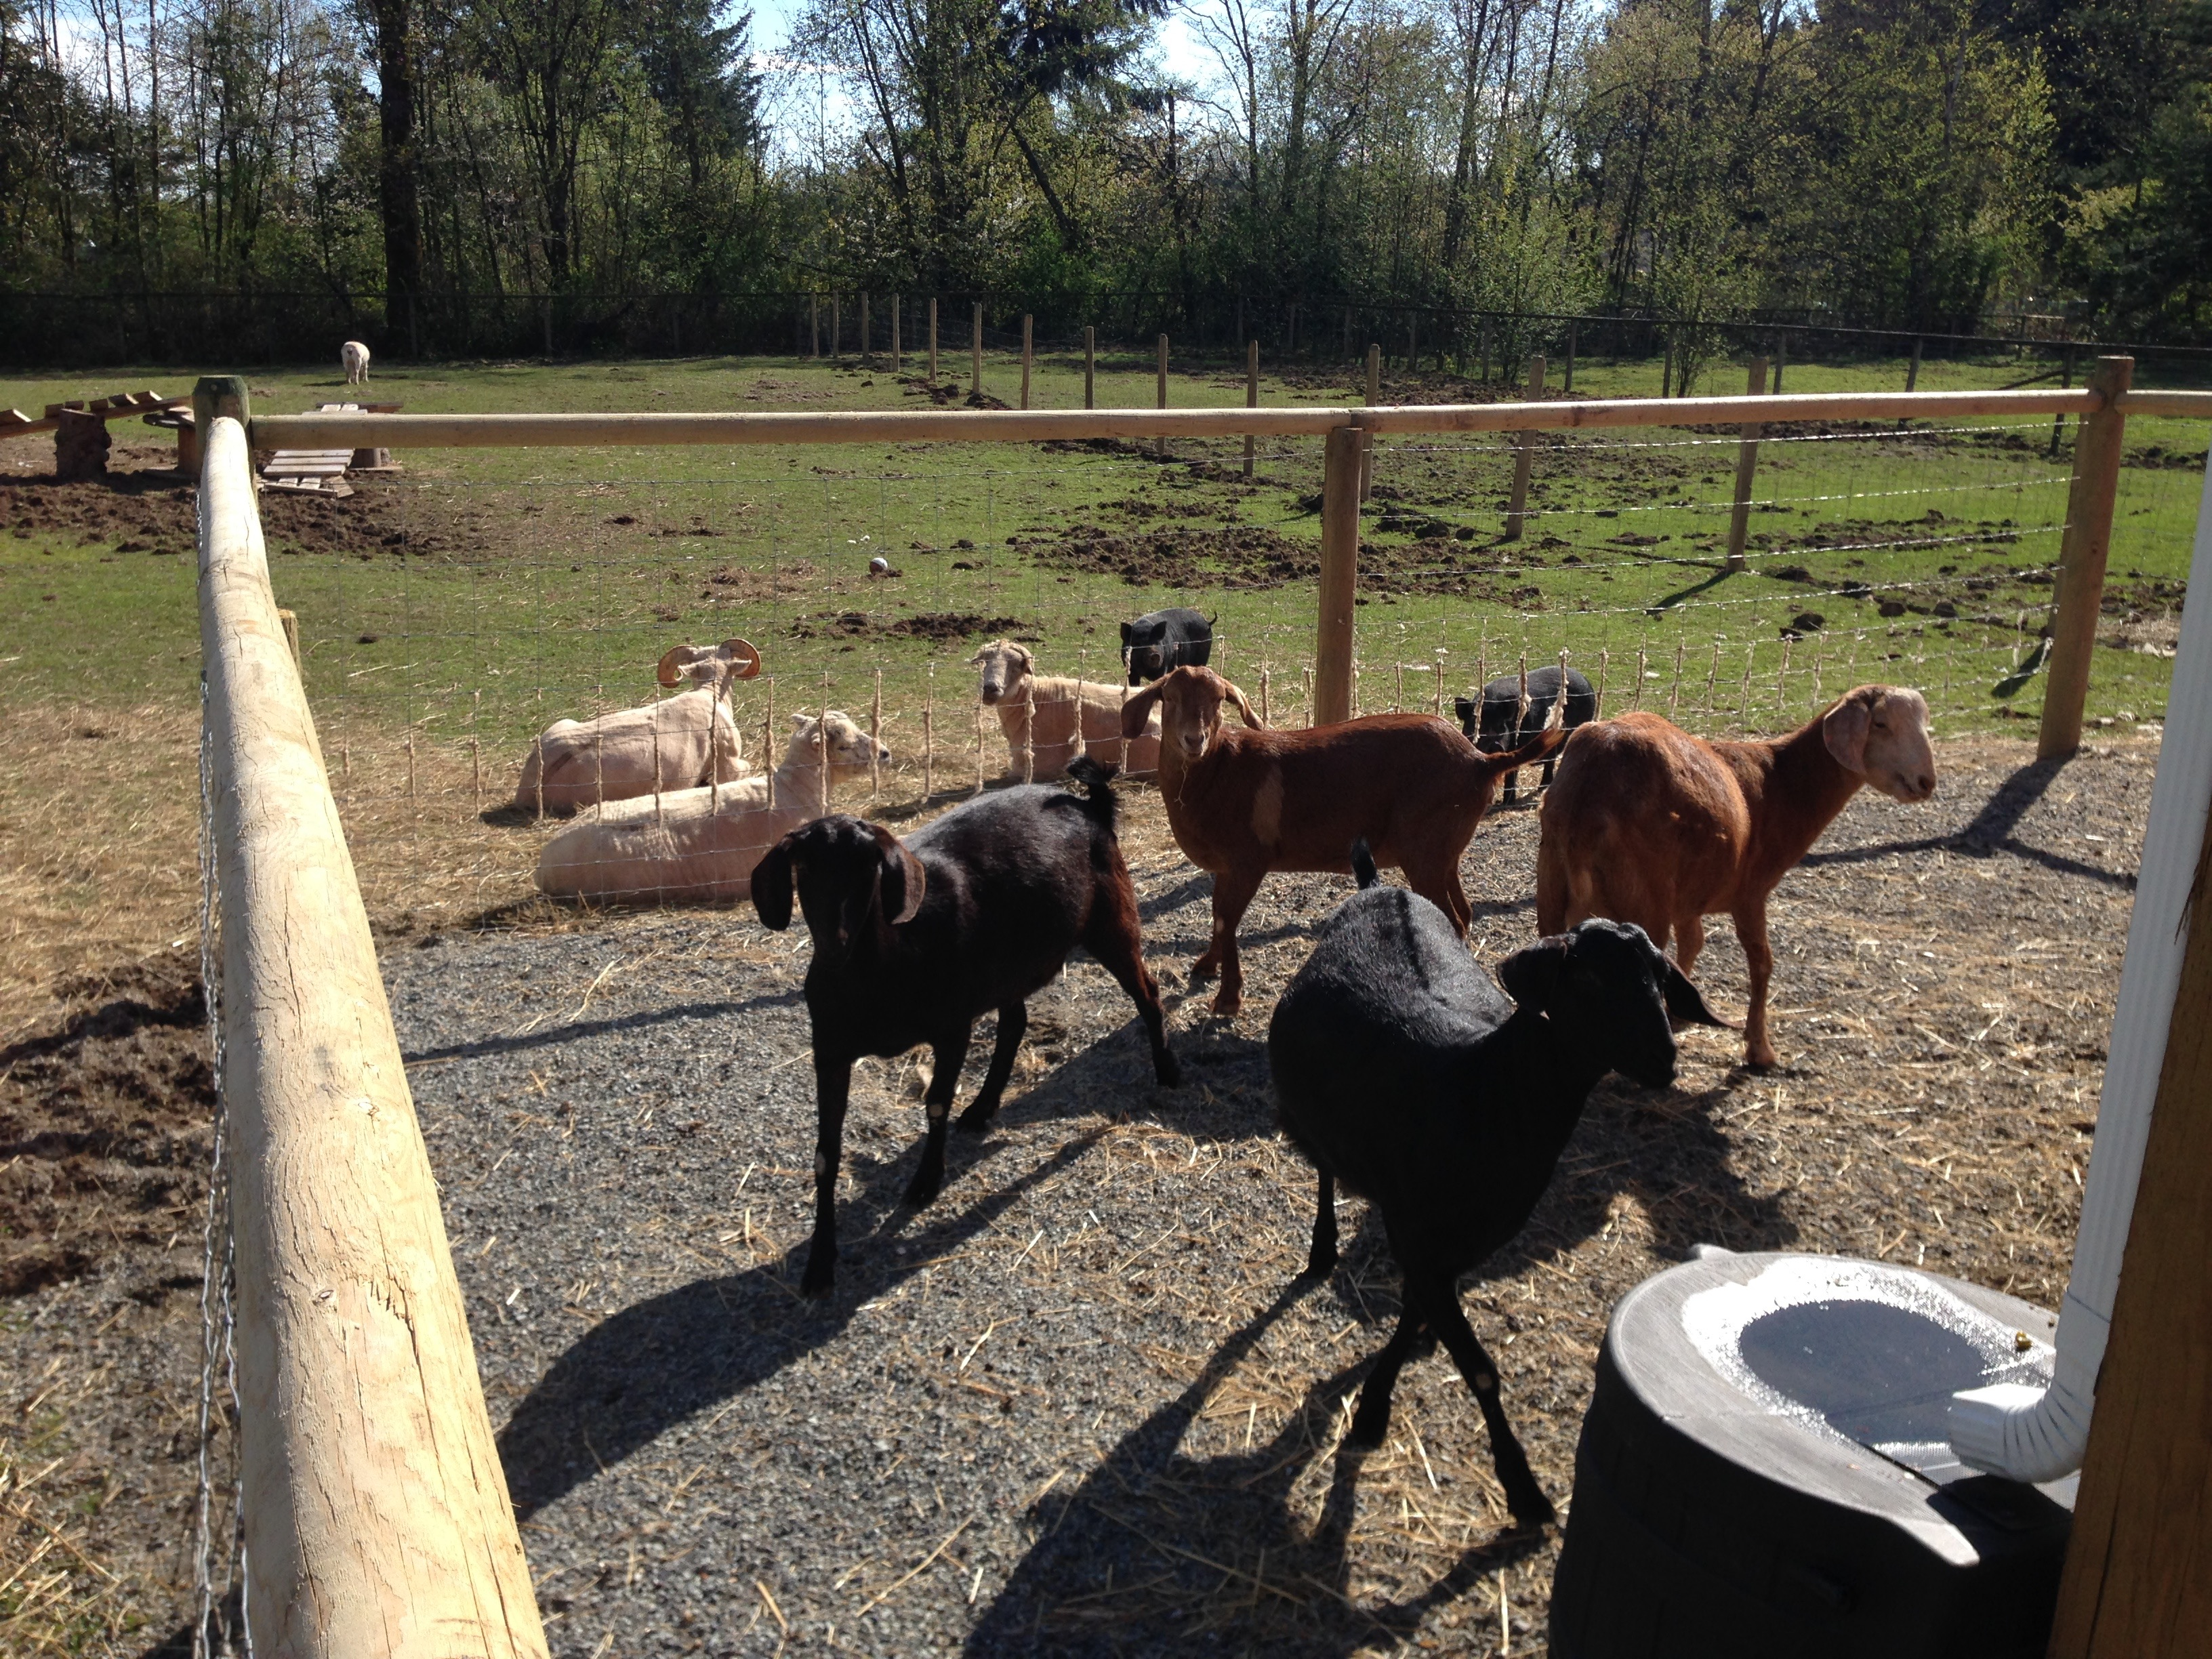 The Honey Goats